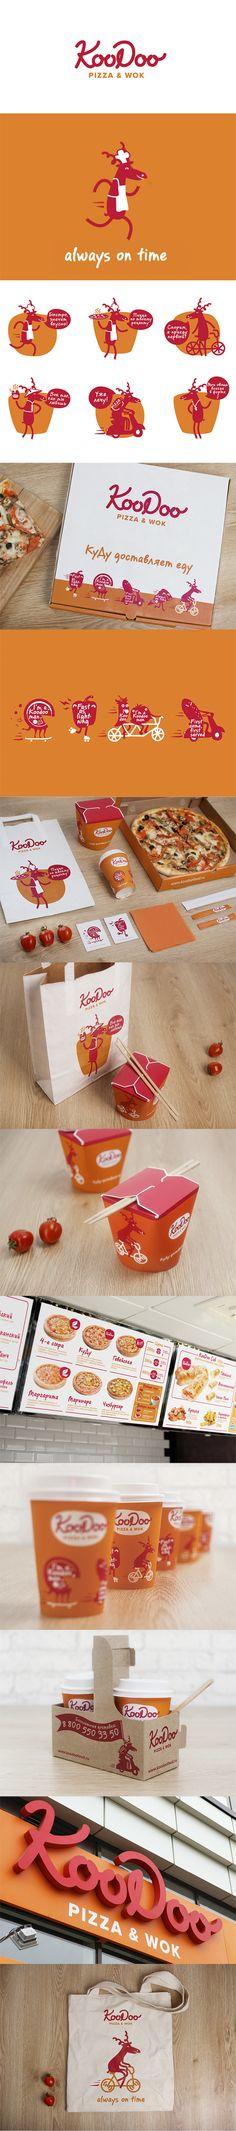 KooDoo Pizza  Wok what a combination! Фирменный стиль © ЛюдаГальченко. Let's eat #identity #packaging Branding PD